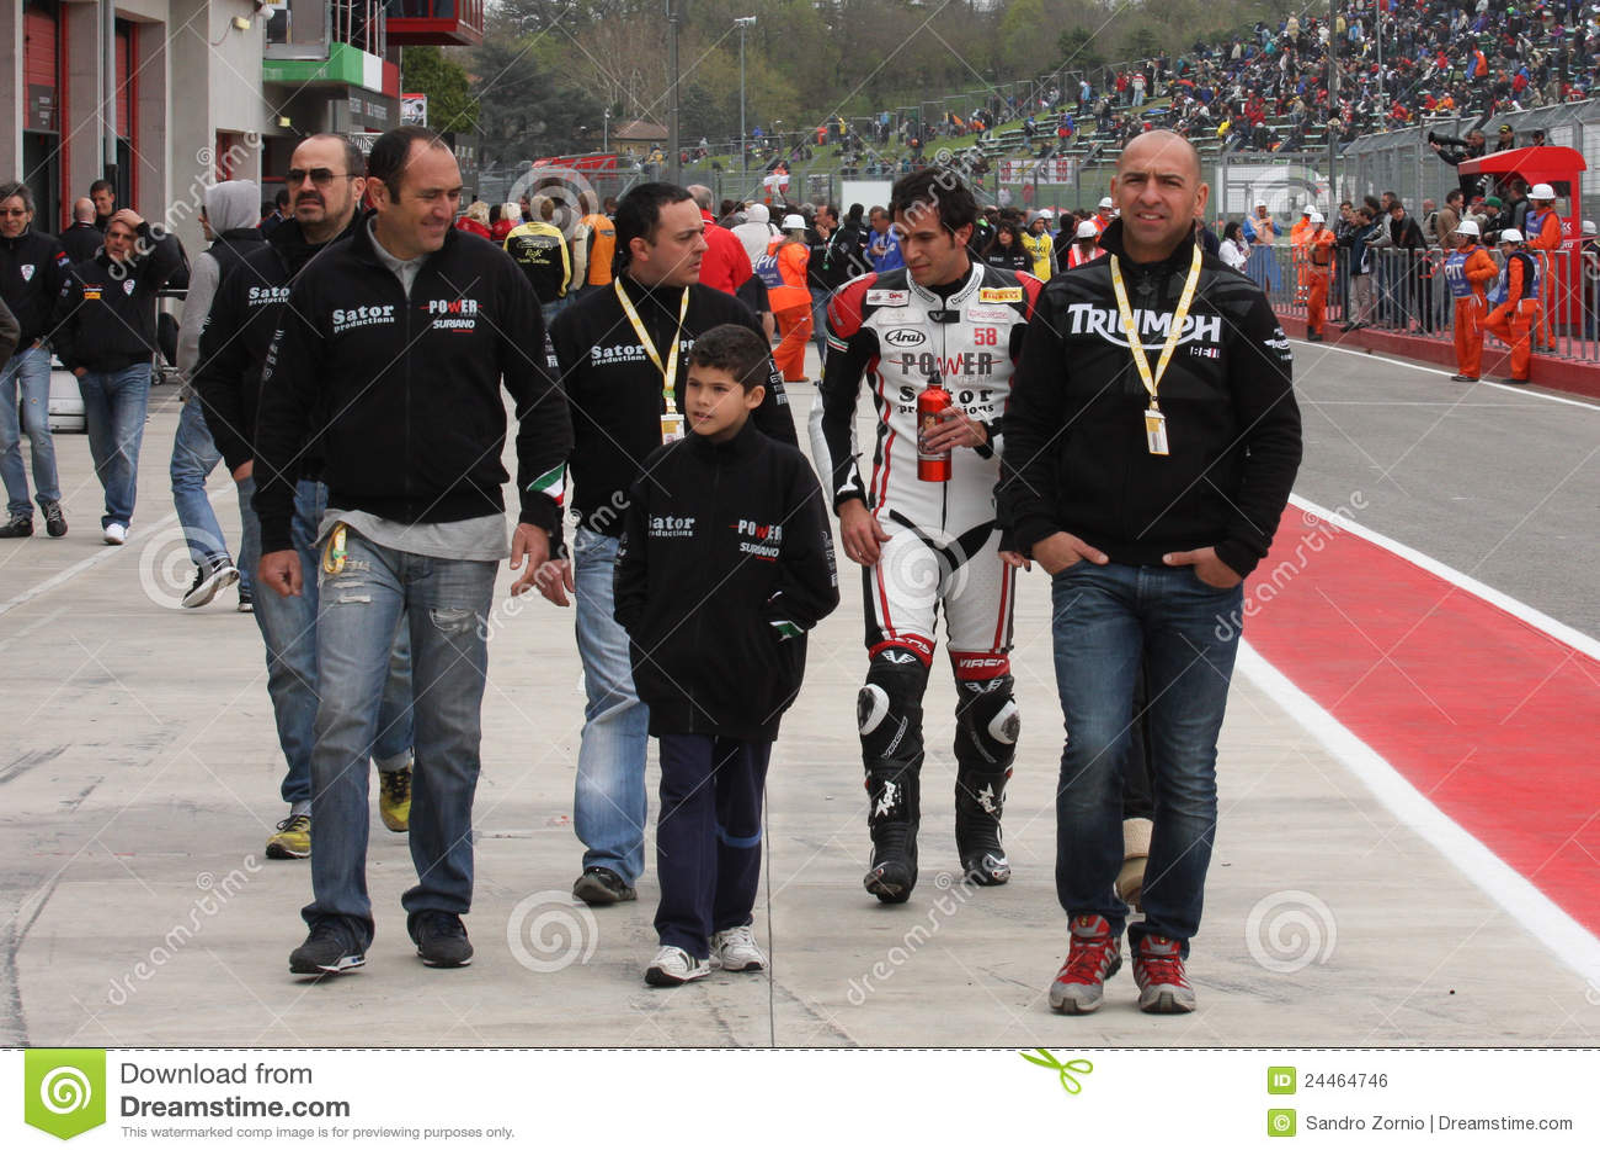 Alex Baldolini Power Team by Suriano